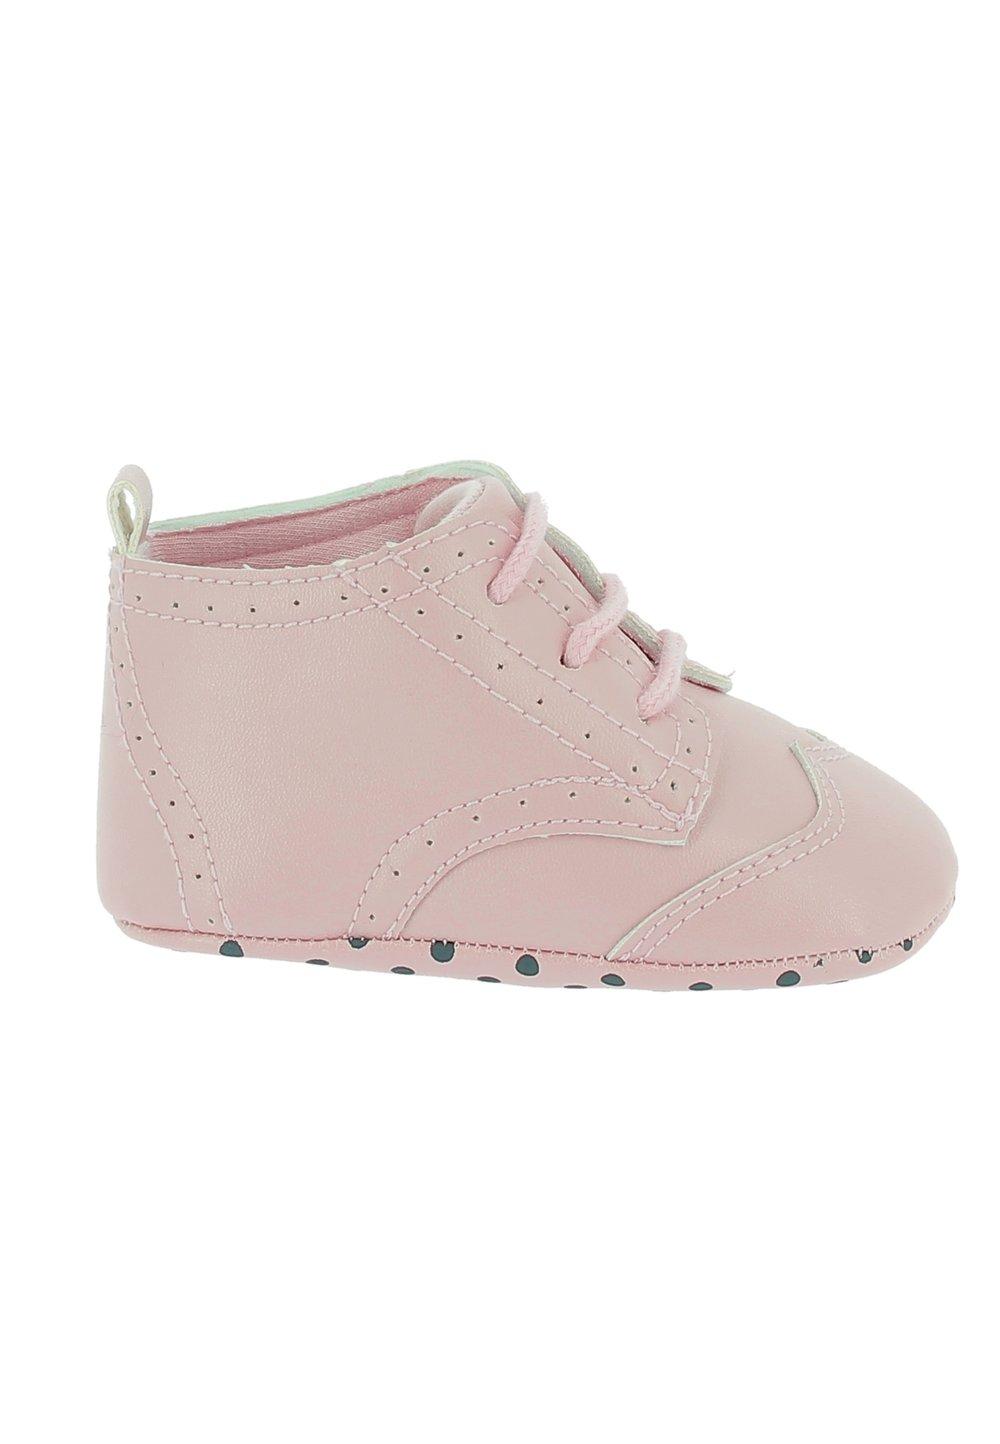 Papucei bebe, roz cu siret imagine